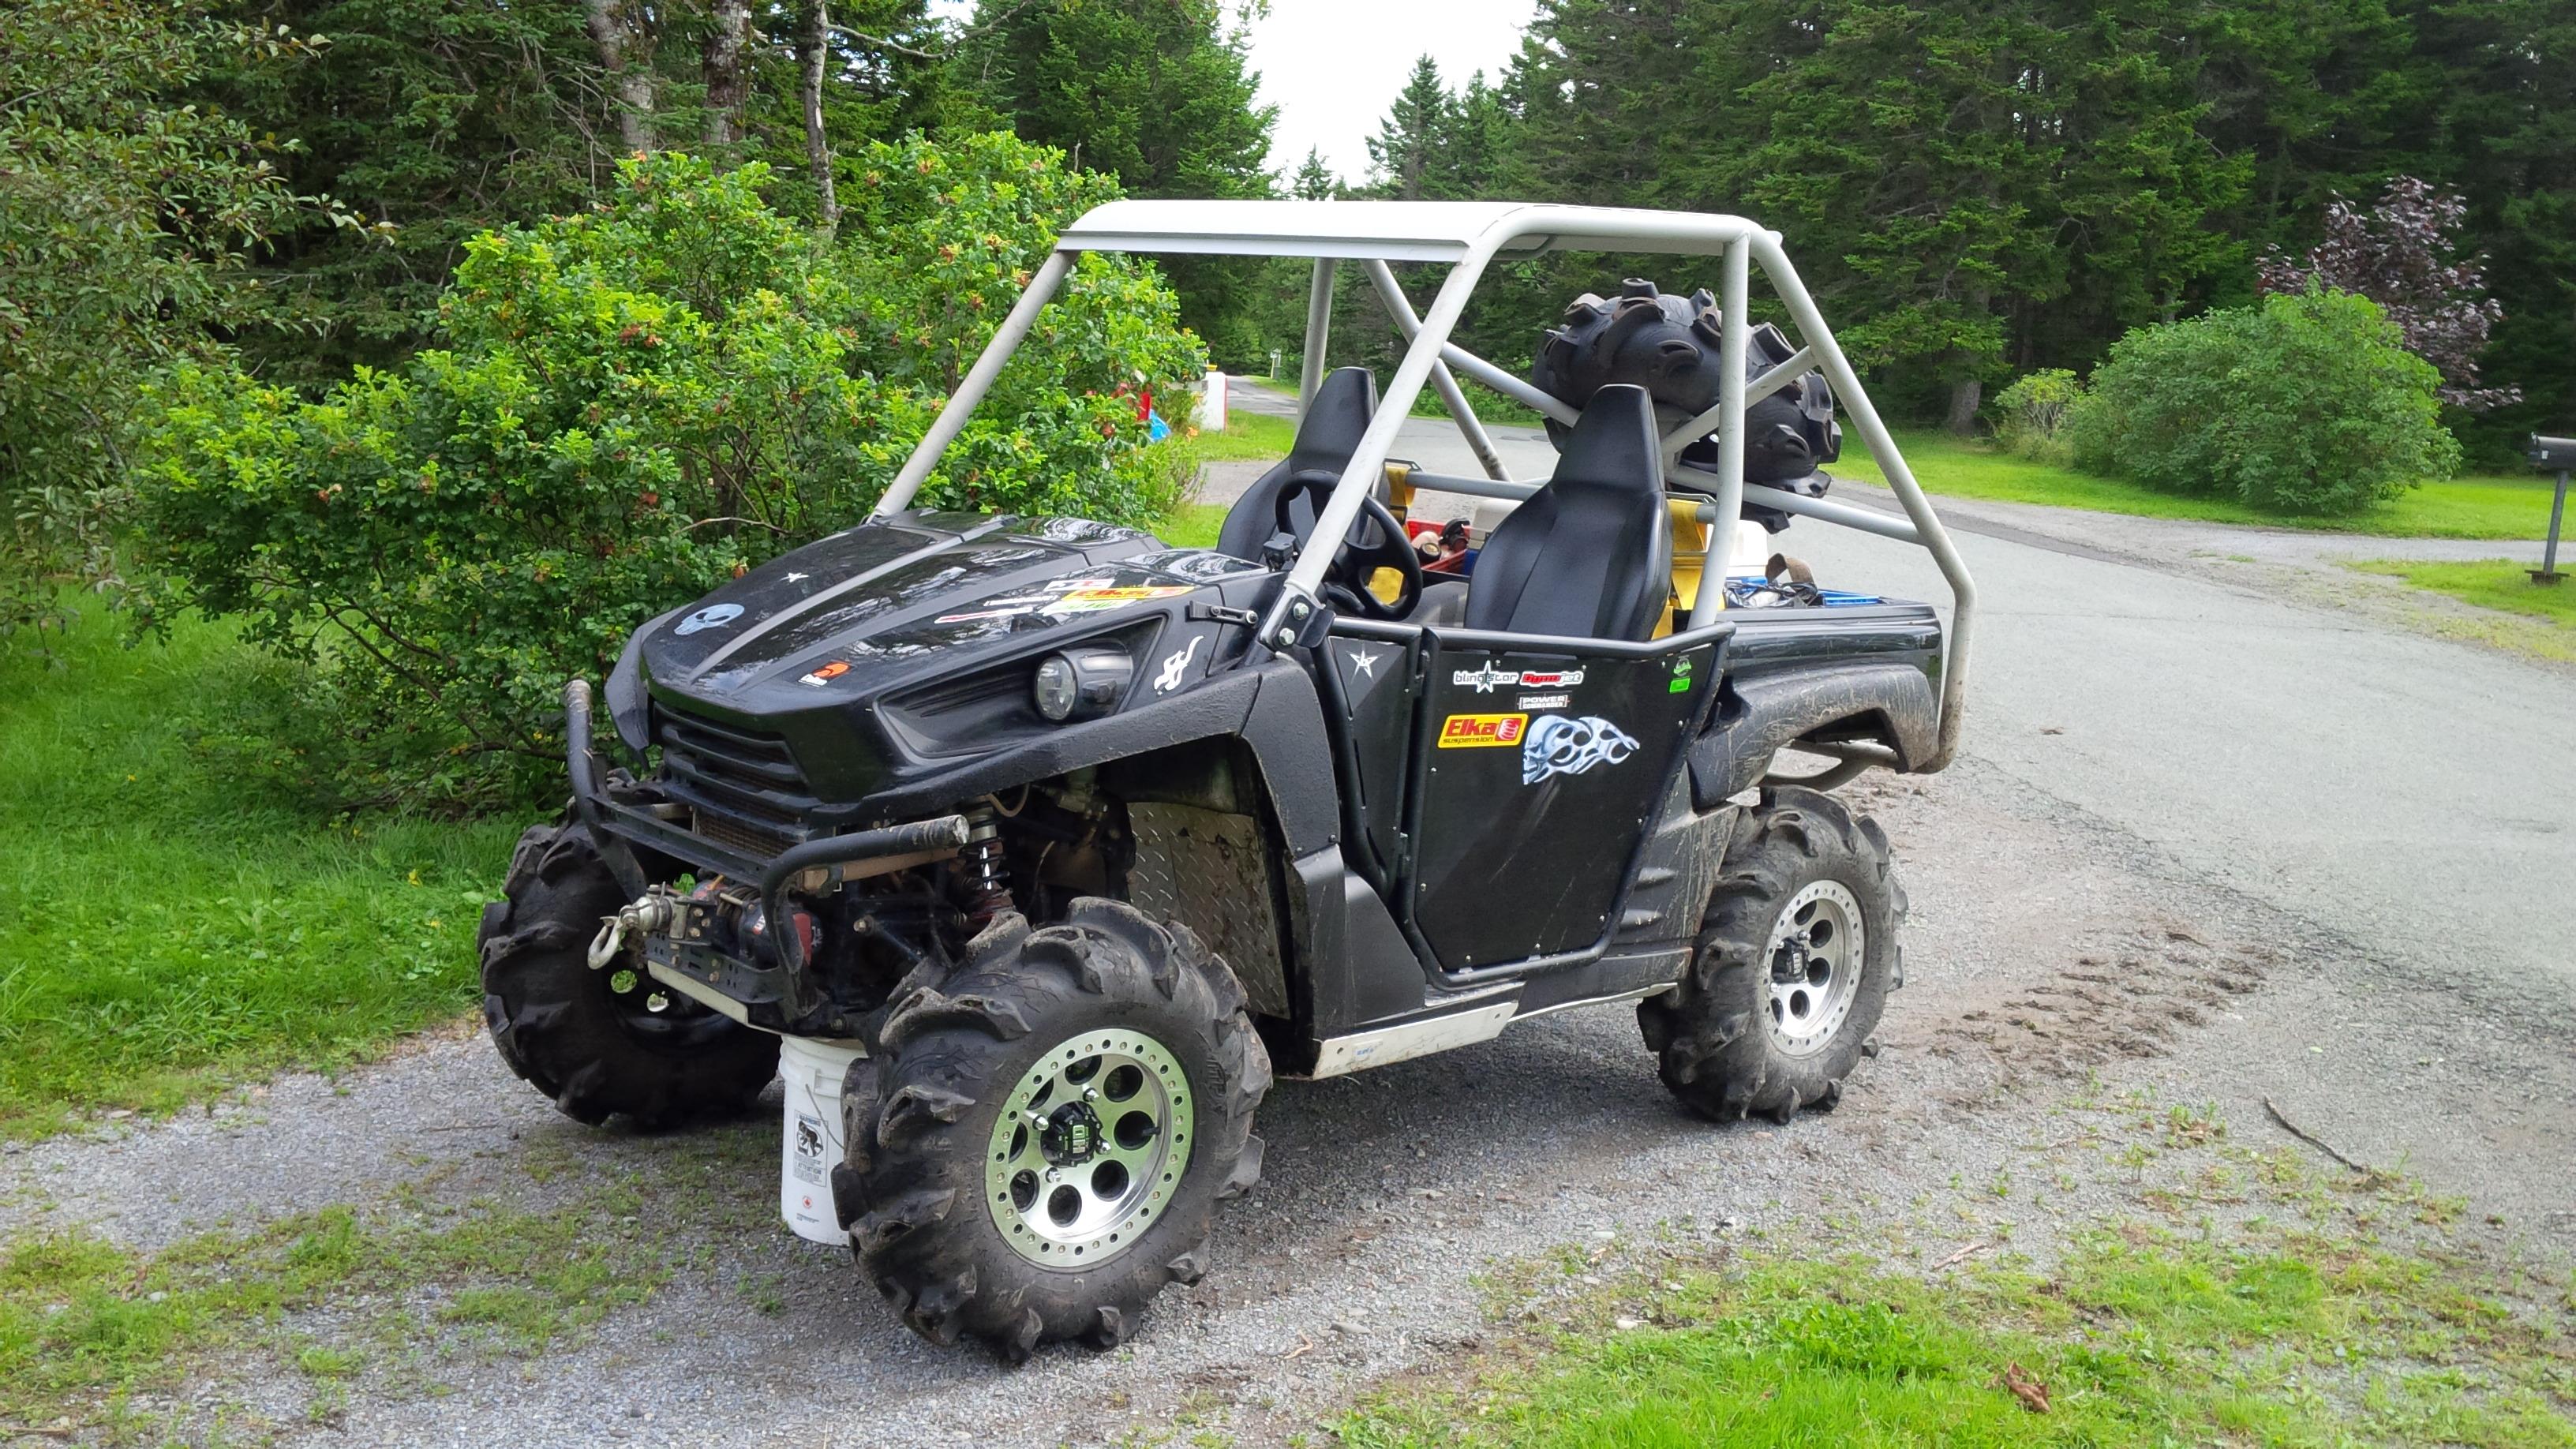 Custom Cage Build On My Ride Kawasaki Teryx Forum